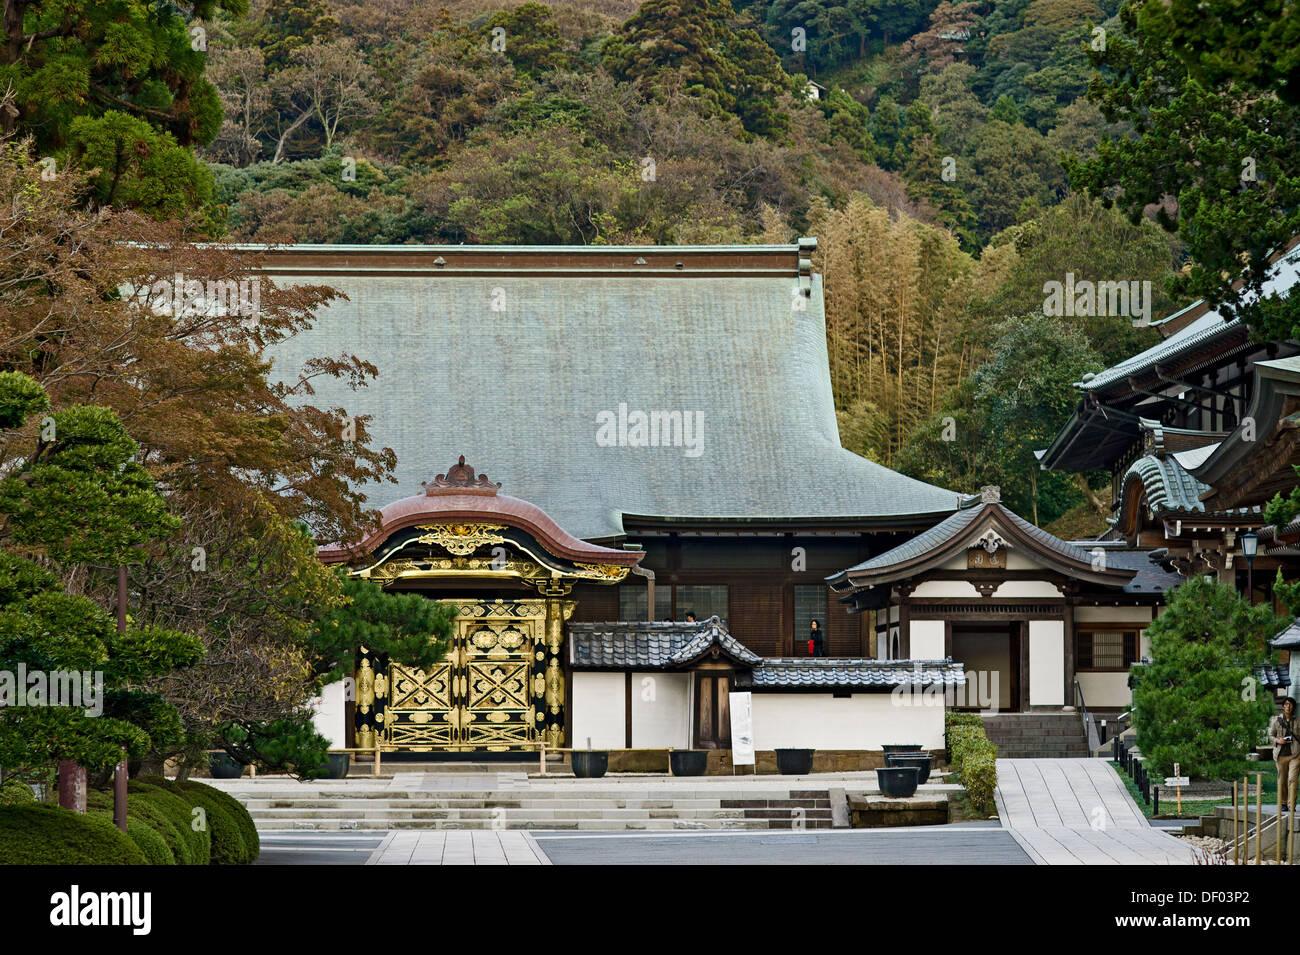 Kencho-ji Temple, Kamakura, Japan. Karamon (Chinese Gate) and Hojo Stock Phot...